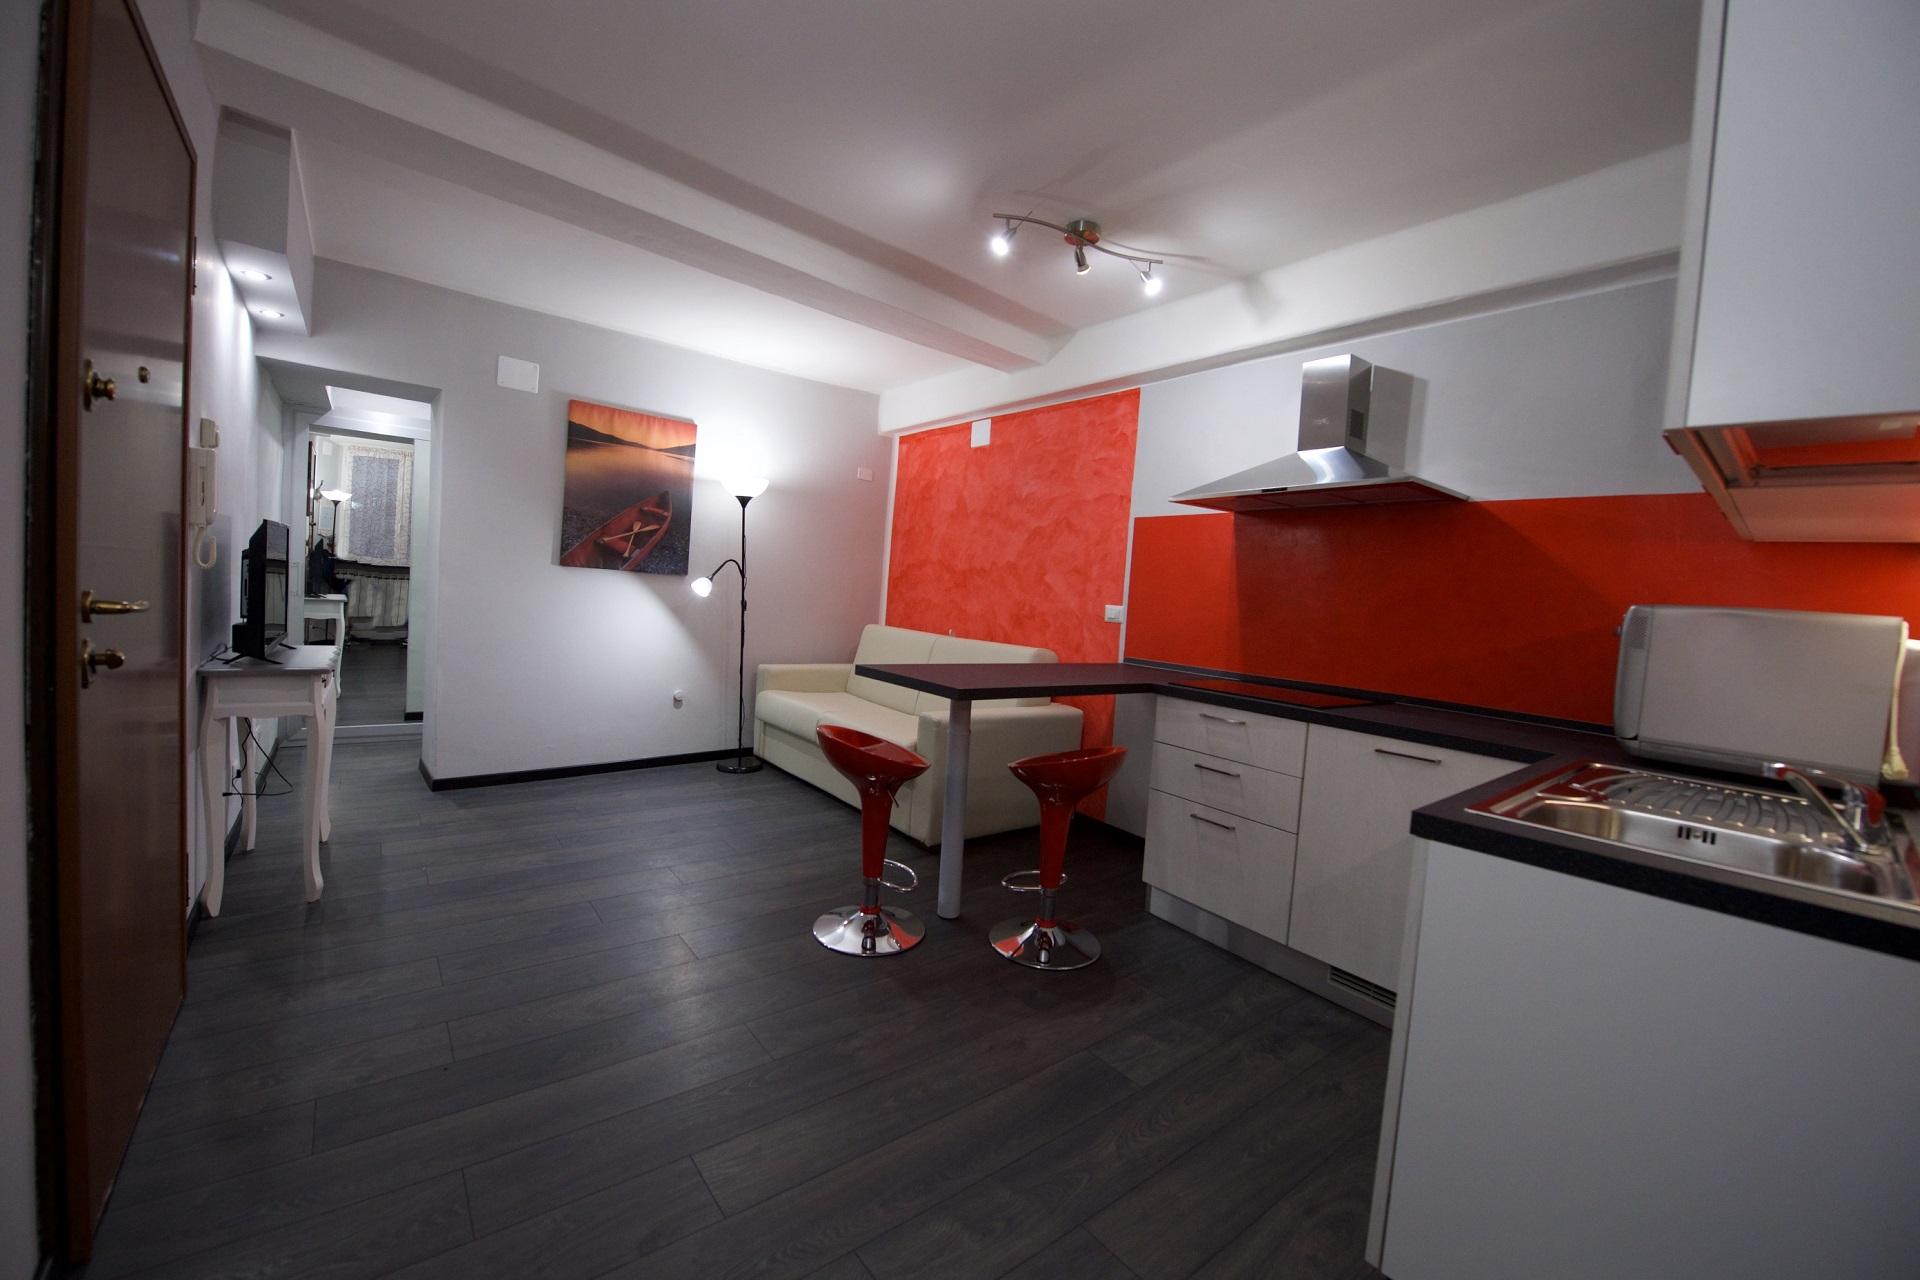 Appartamenti vacanze savona appartamenti casalice for Appartamenti affittasi